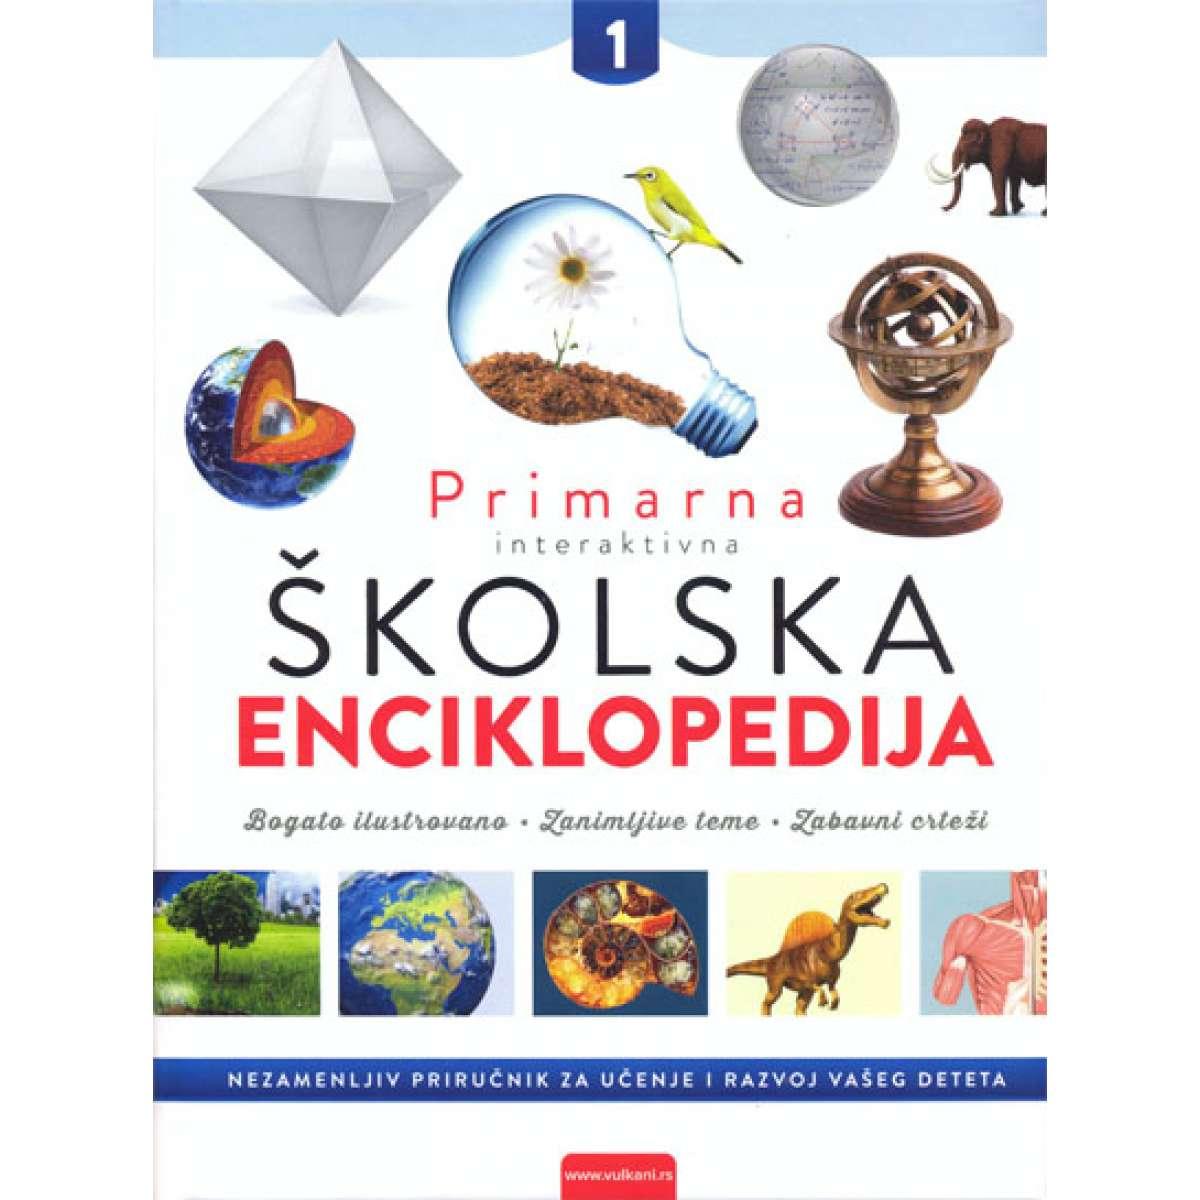 PRVA INTERAKTIVNA ŠKOLSKA ENCIKLOPEDIJA 1-3